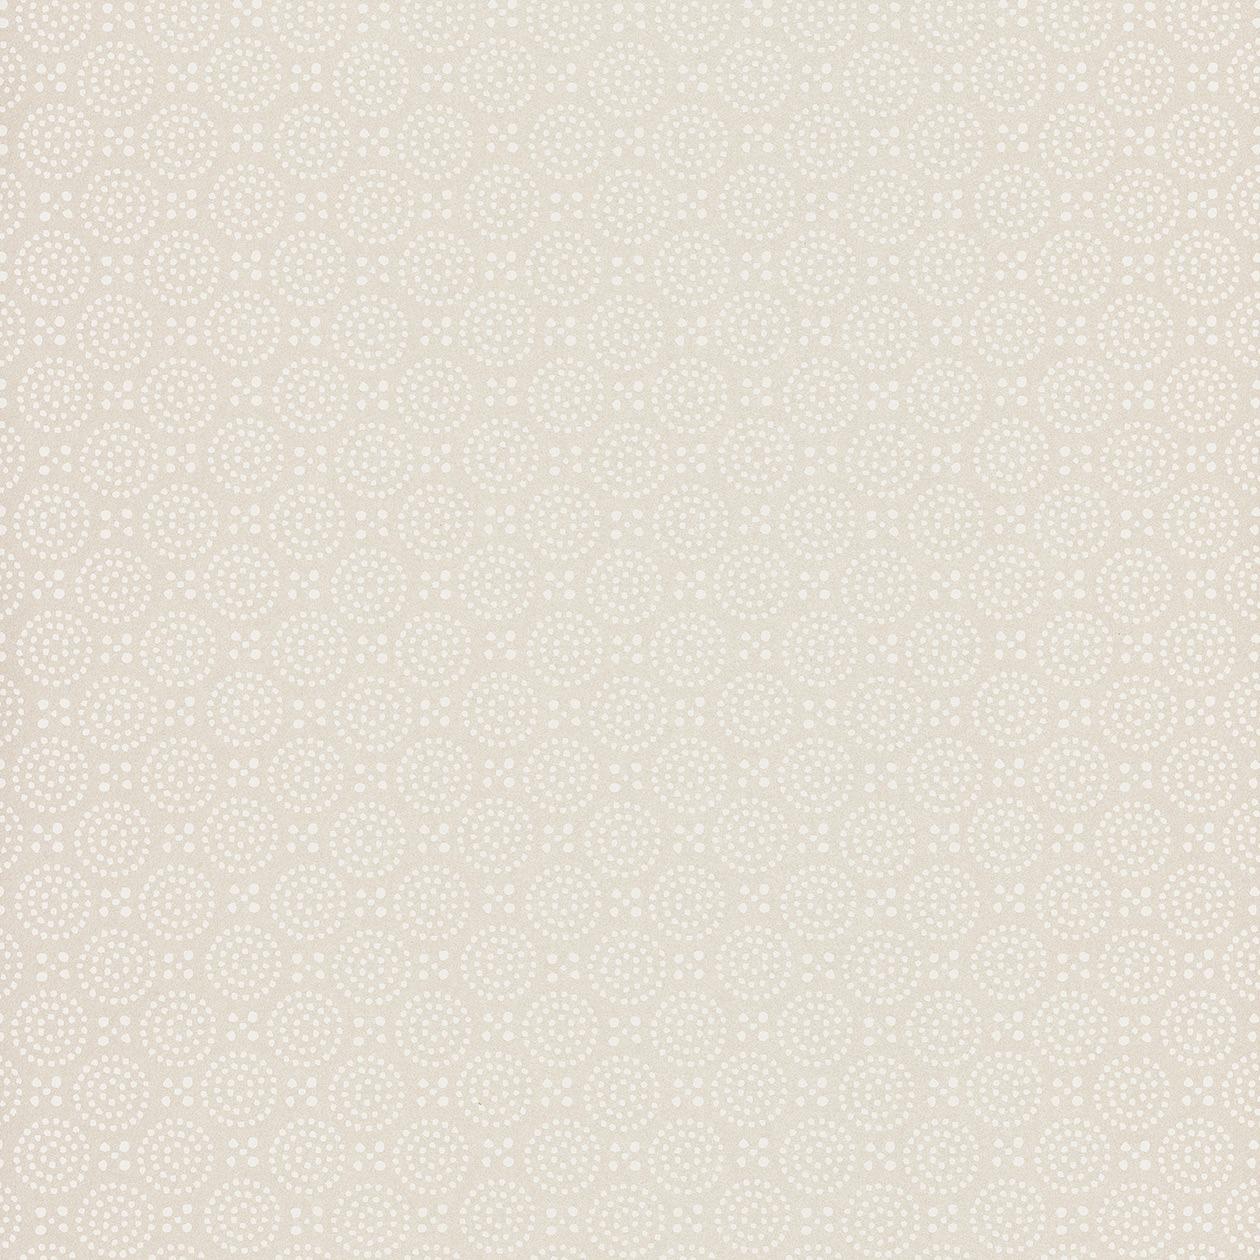 Французские обои Caselio,  коллекция Trio, артикулTIO68040005